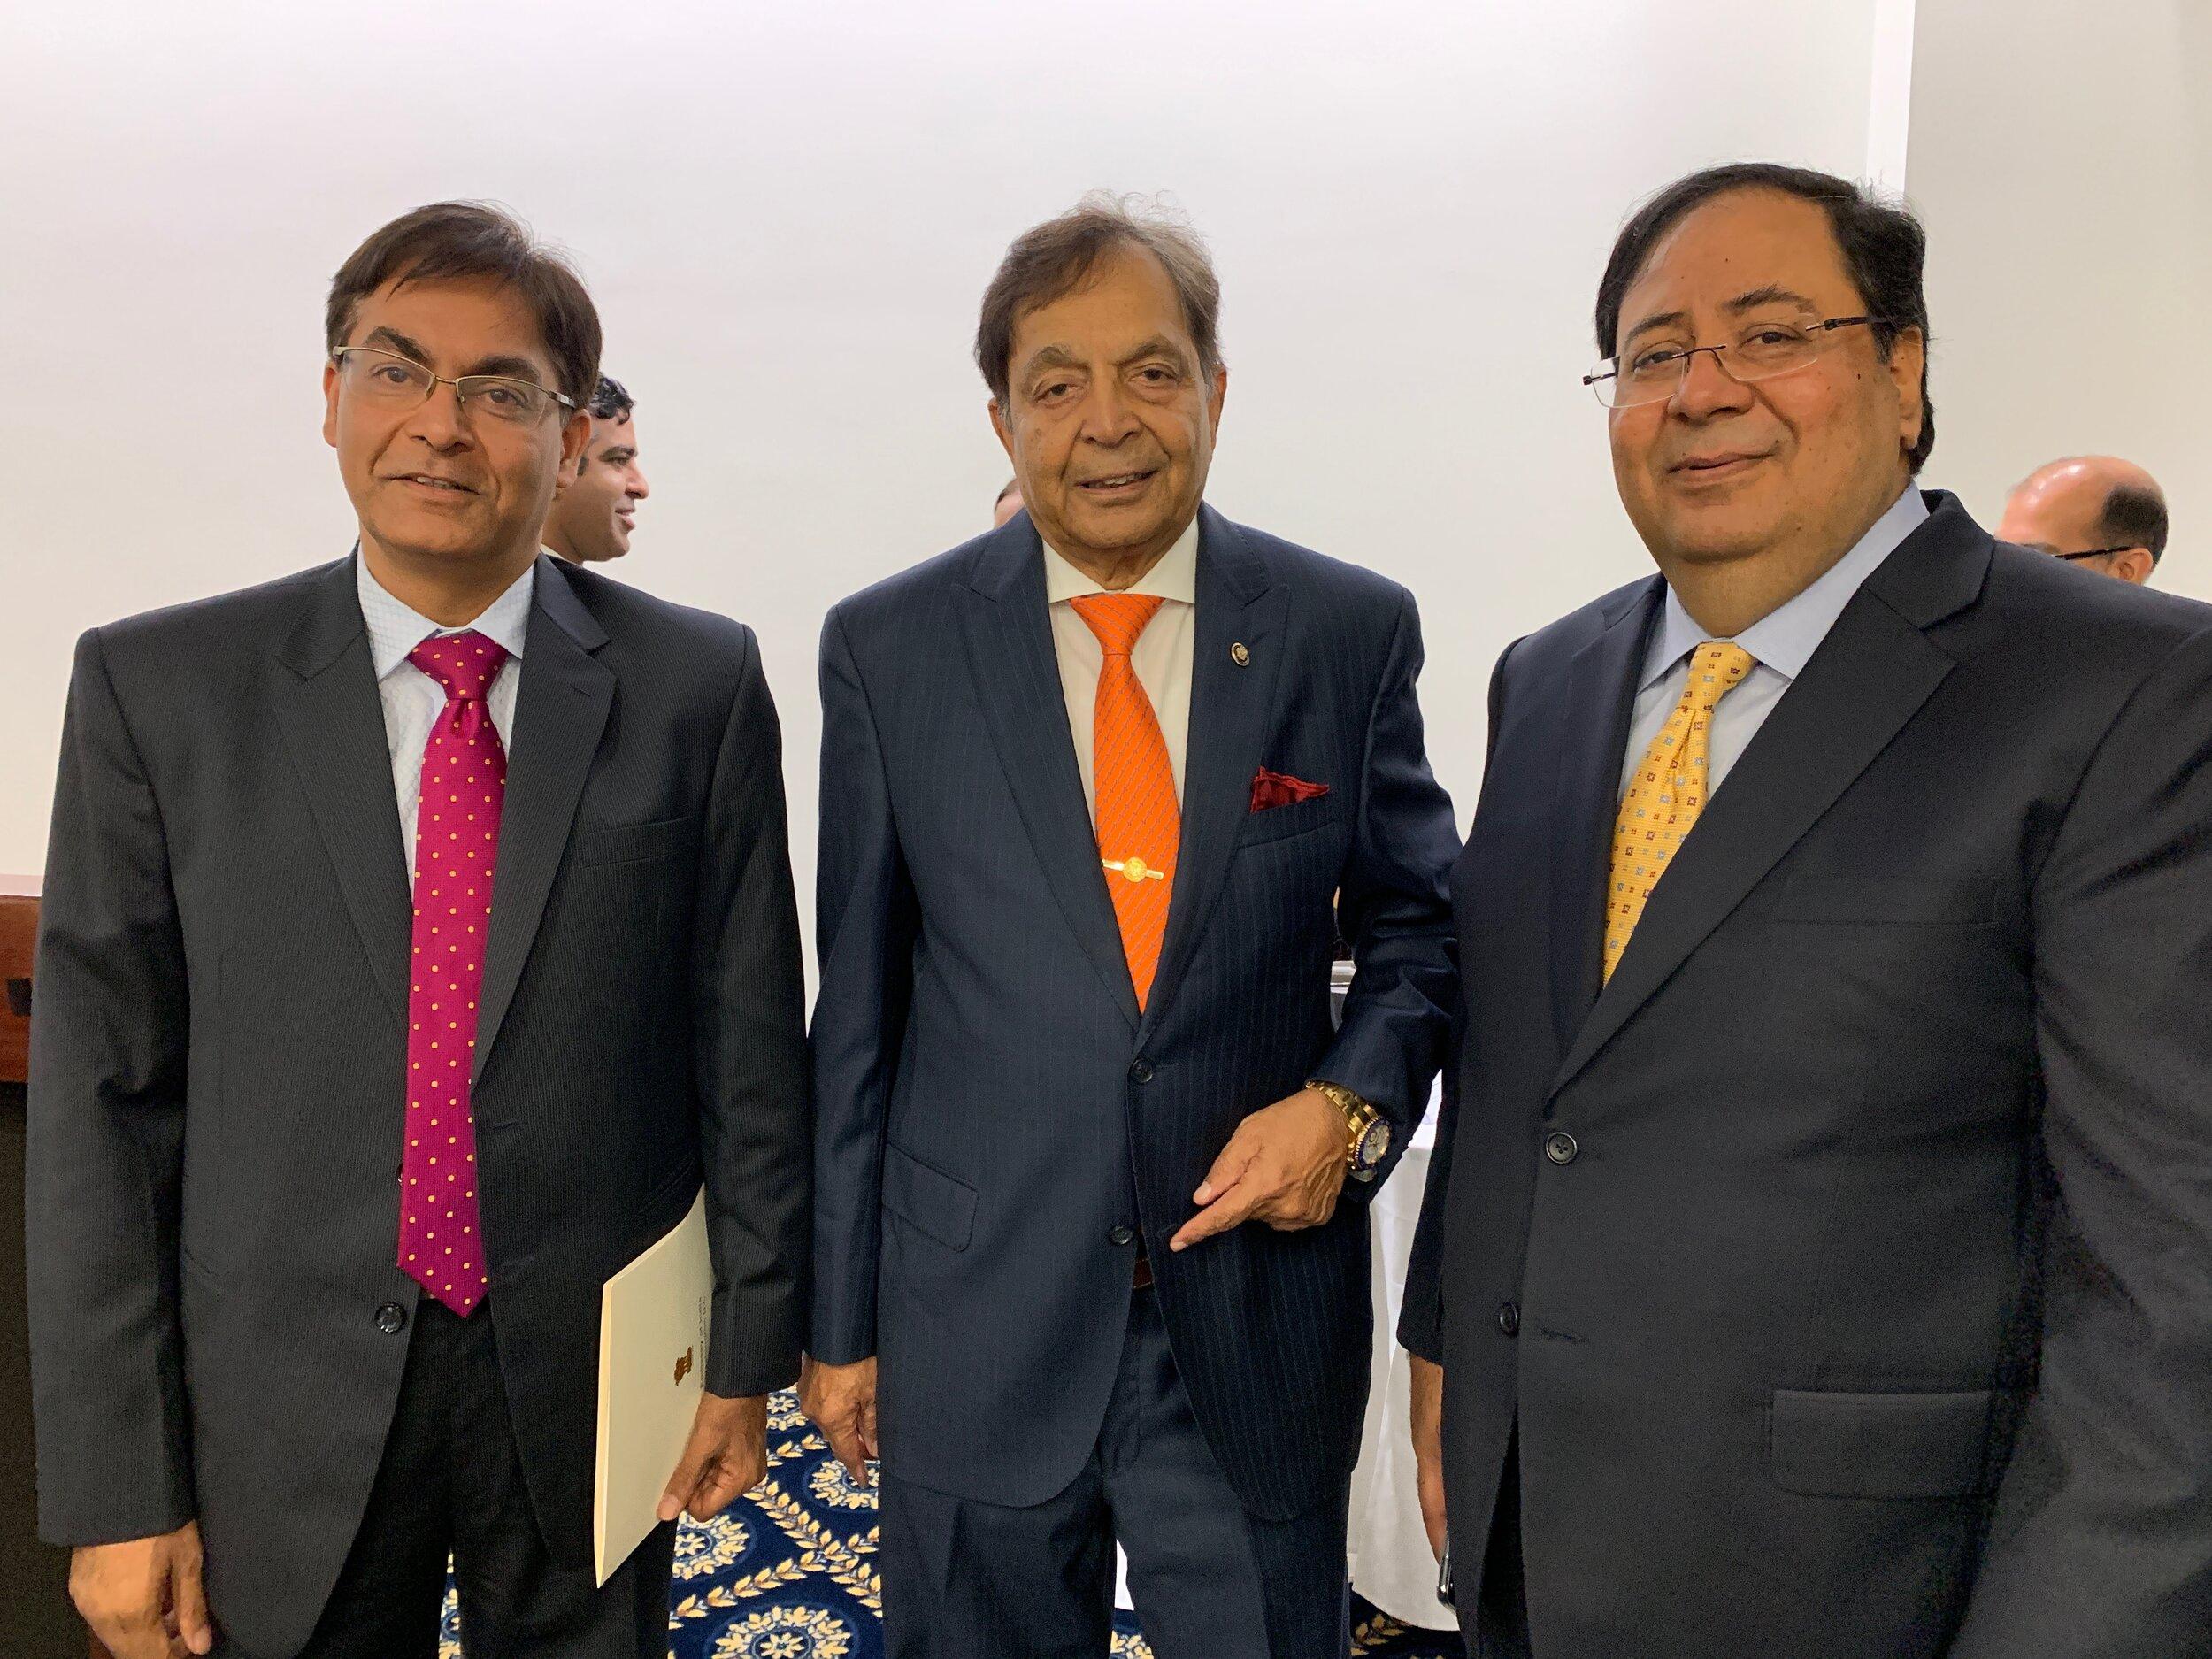 From Left to Right:  Mr. Amit Kumar (Deputy Chief of Mission, Embassy of India), Dr. Sampat Shivangi (Advisory Board Member - RealAssets), Mr. Suresh Nichani (Chairman-RealAssets)